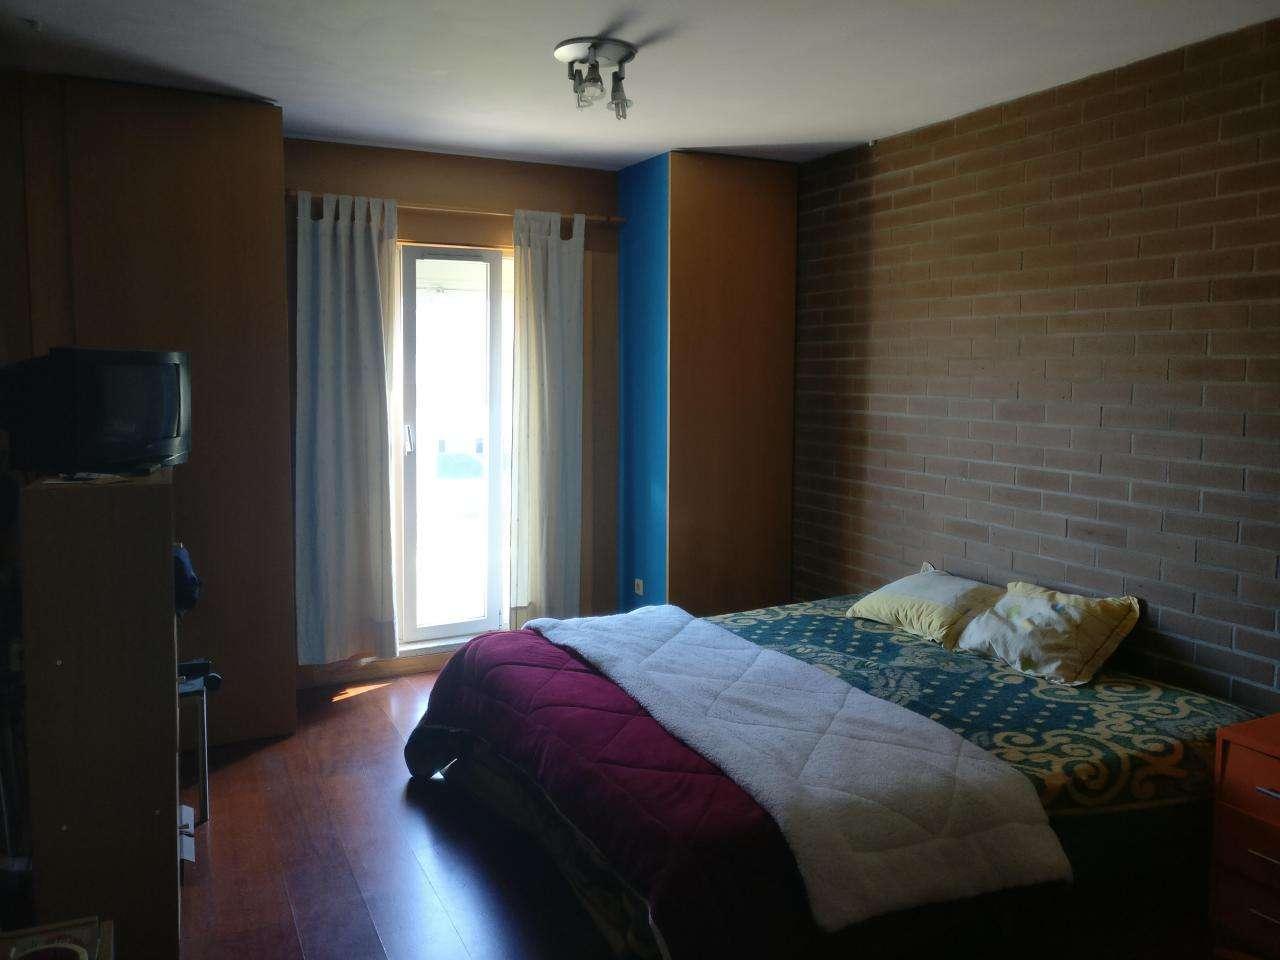 Apartamento para comprar, Covilhã e Canhoso, Covilhã, Castelo Branco - Foto 1